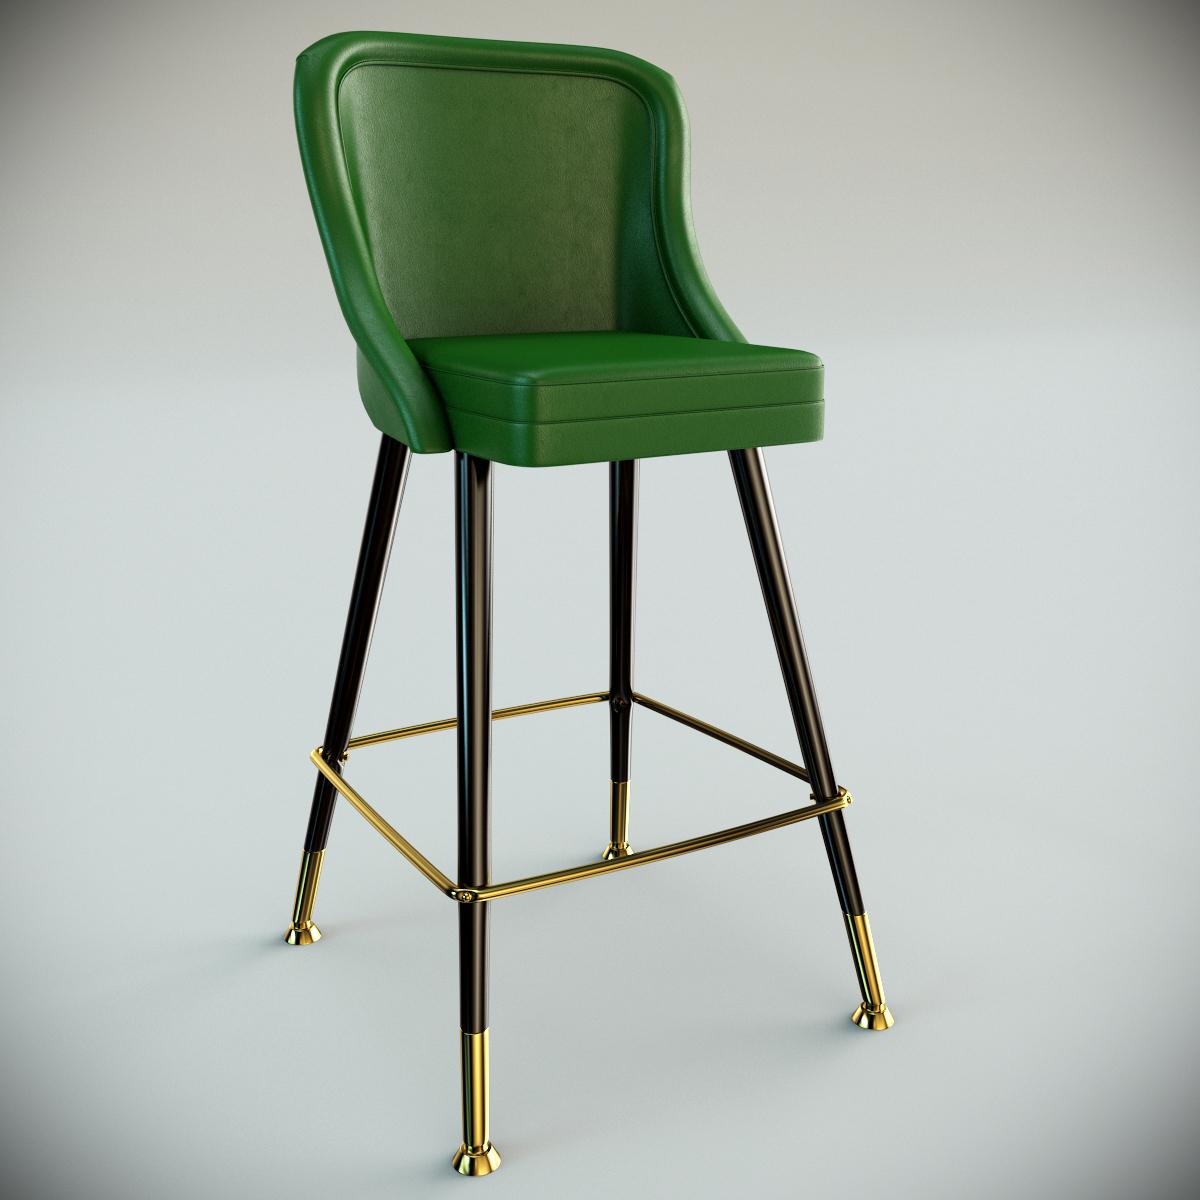 Pleasing Richardson Seating Lounge Bar Stool Camellatalisay Diy Chair Ideas Camellatalisaycom